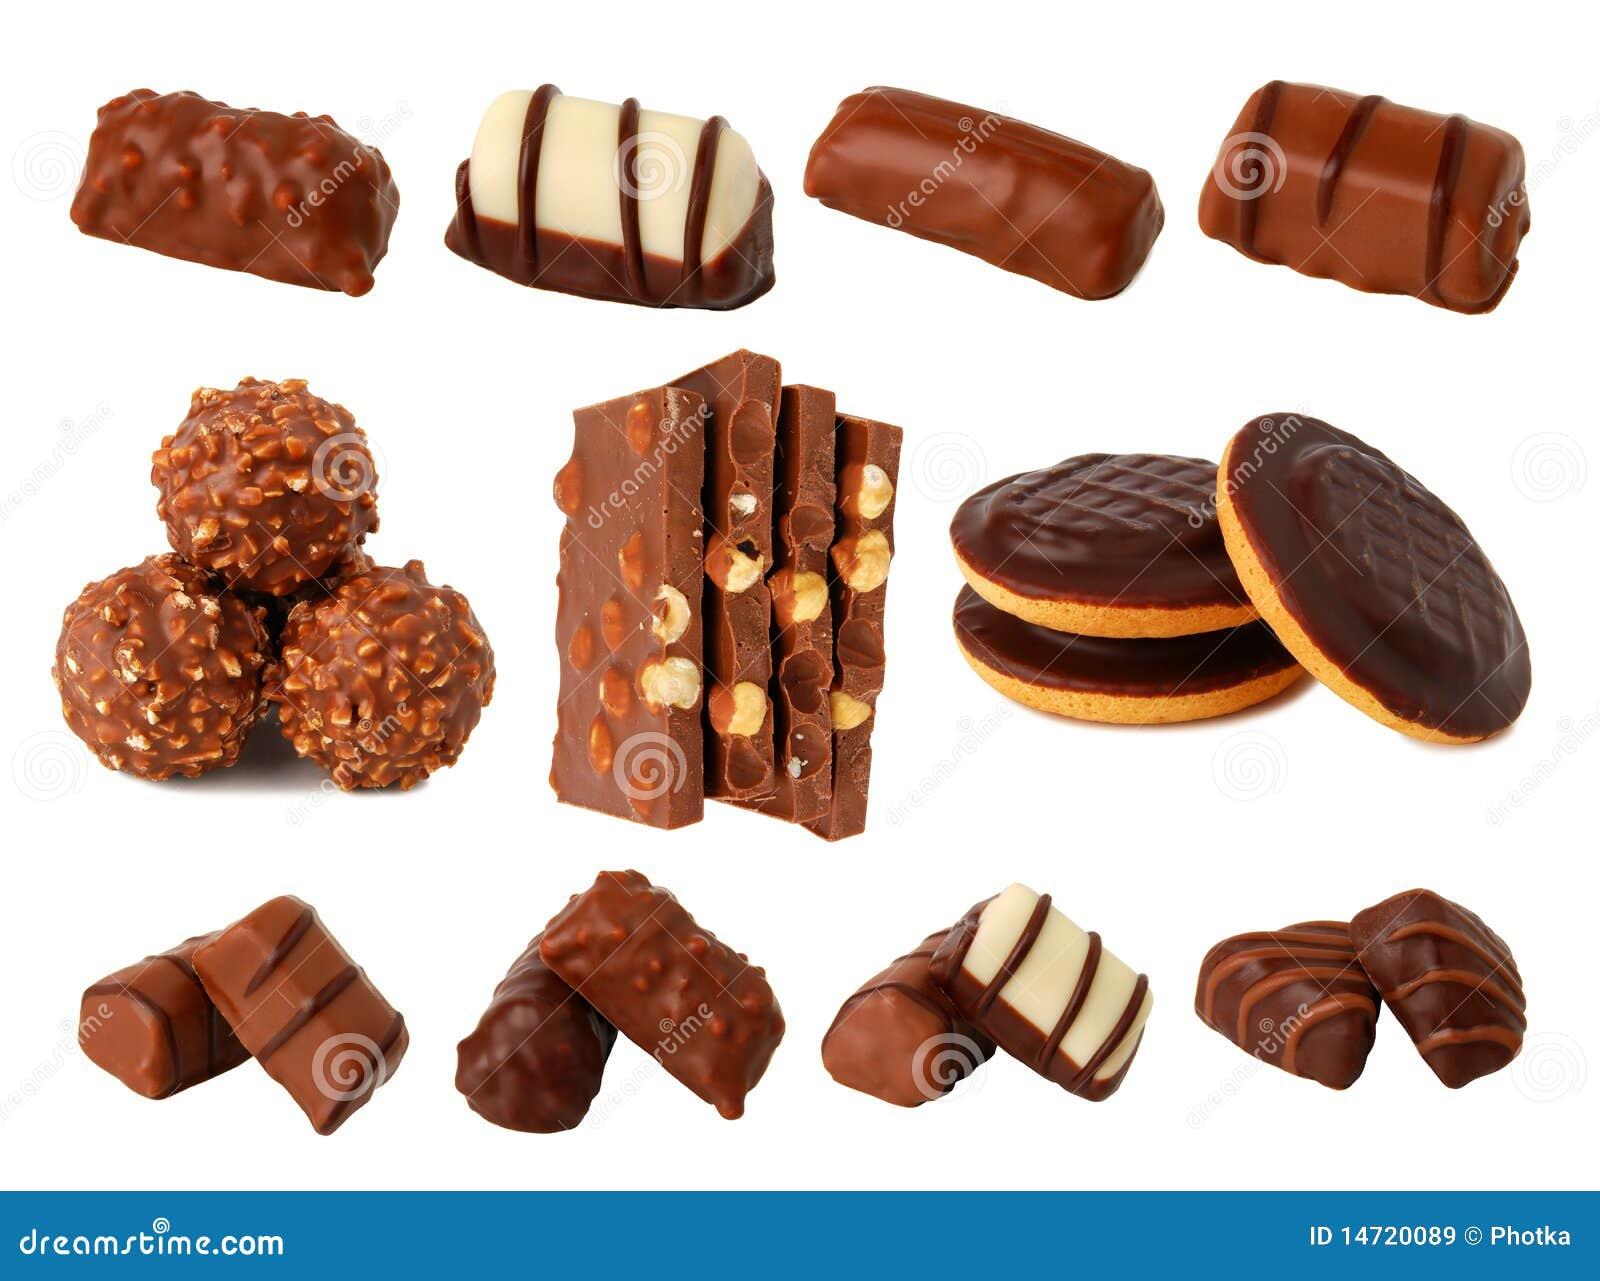 Chocolate and chocolates